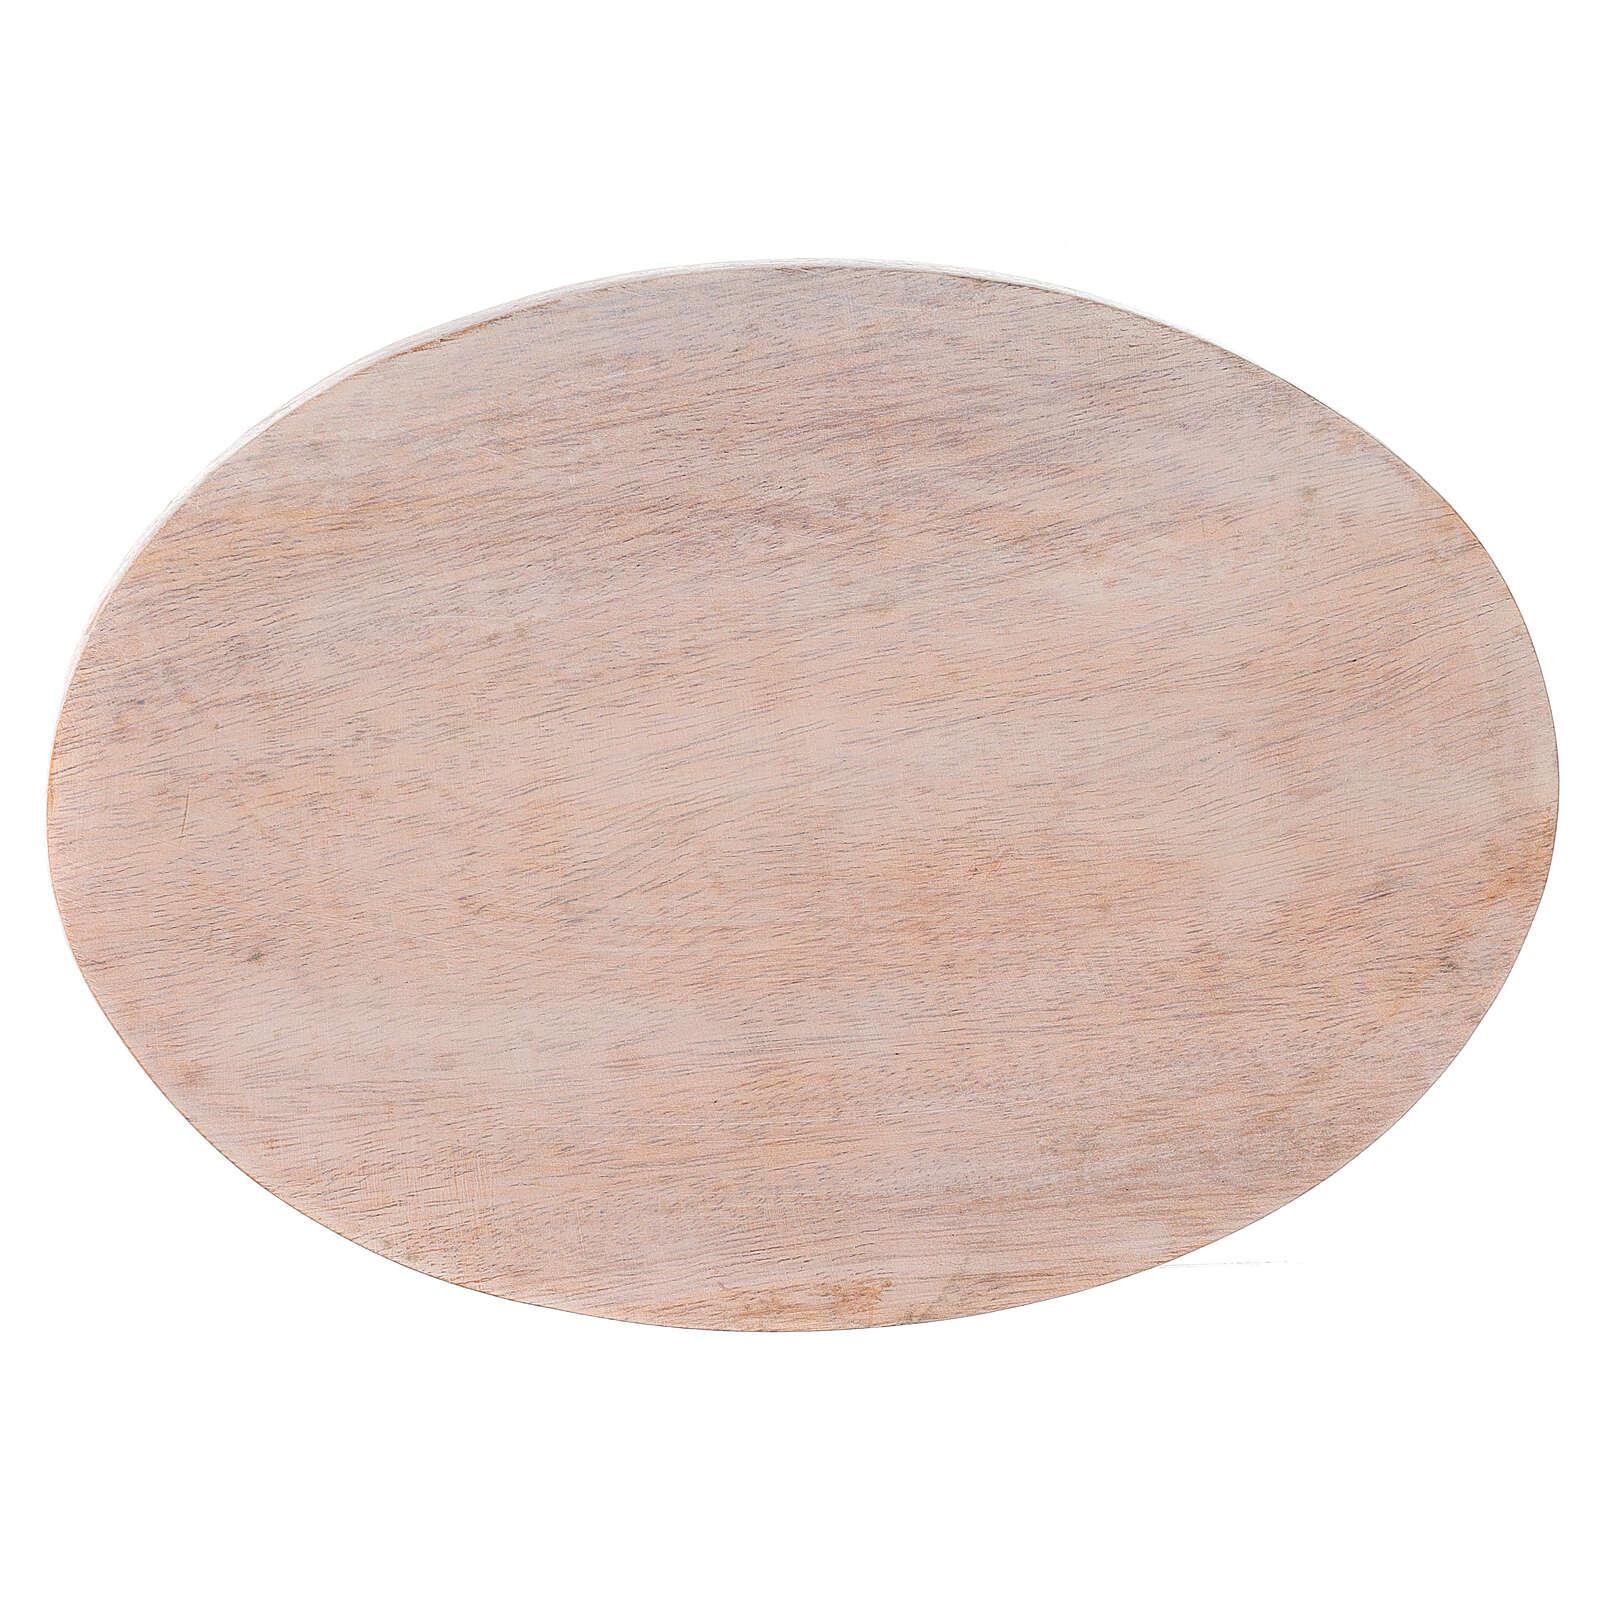 Plato madera mango claro vela 17x12 cm 3